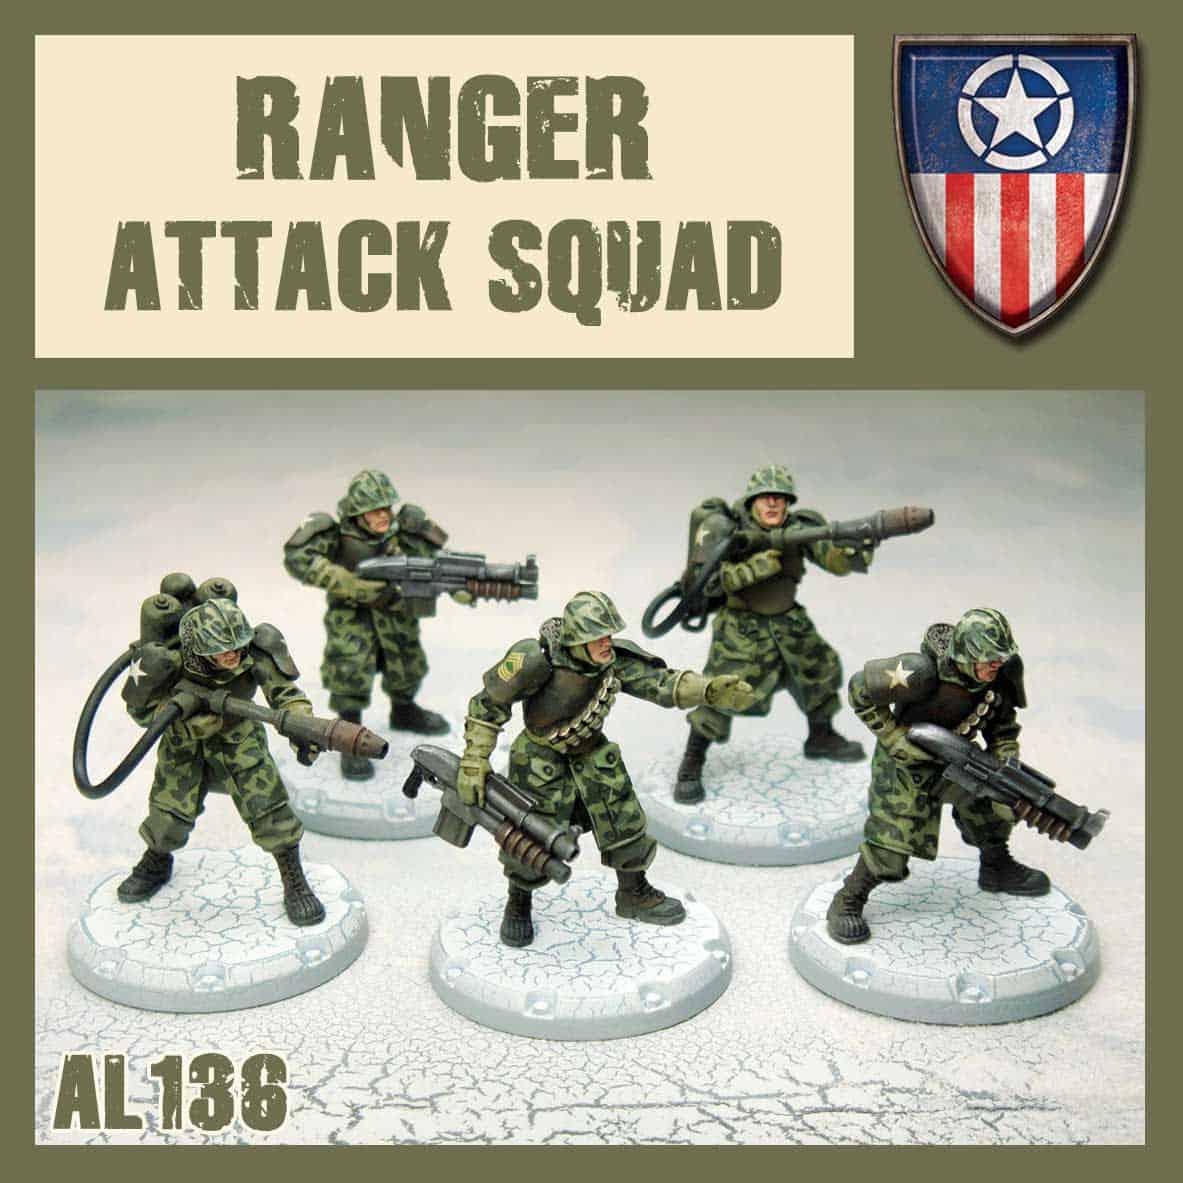 Ranger Attack Squad